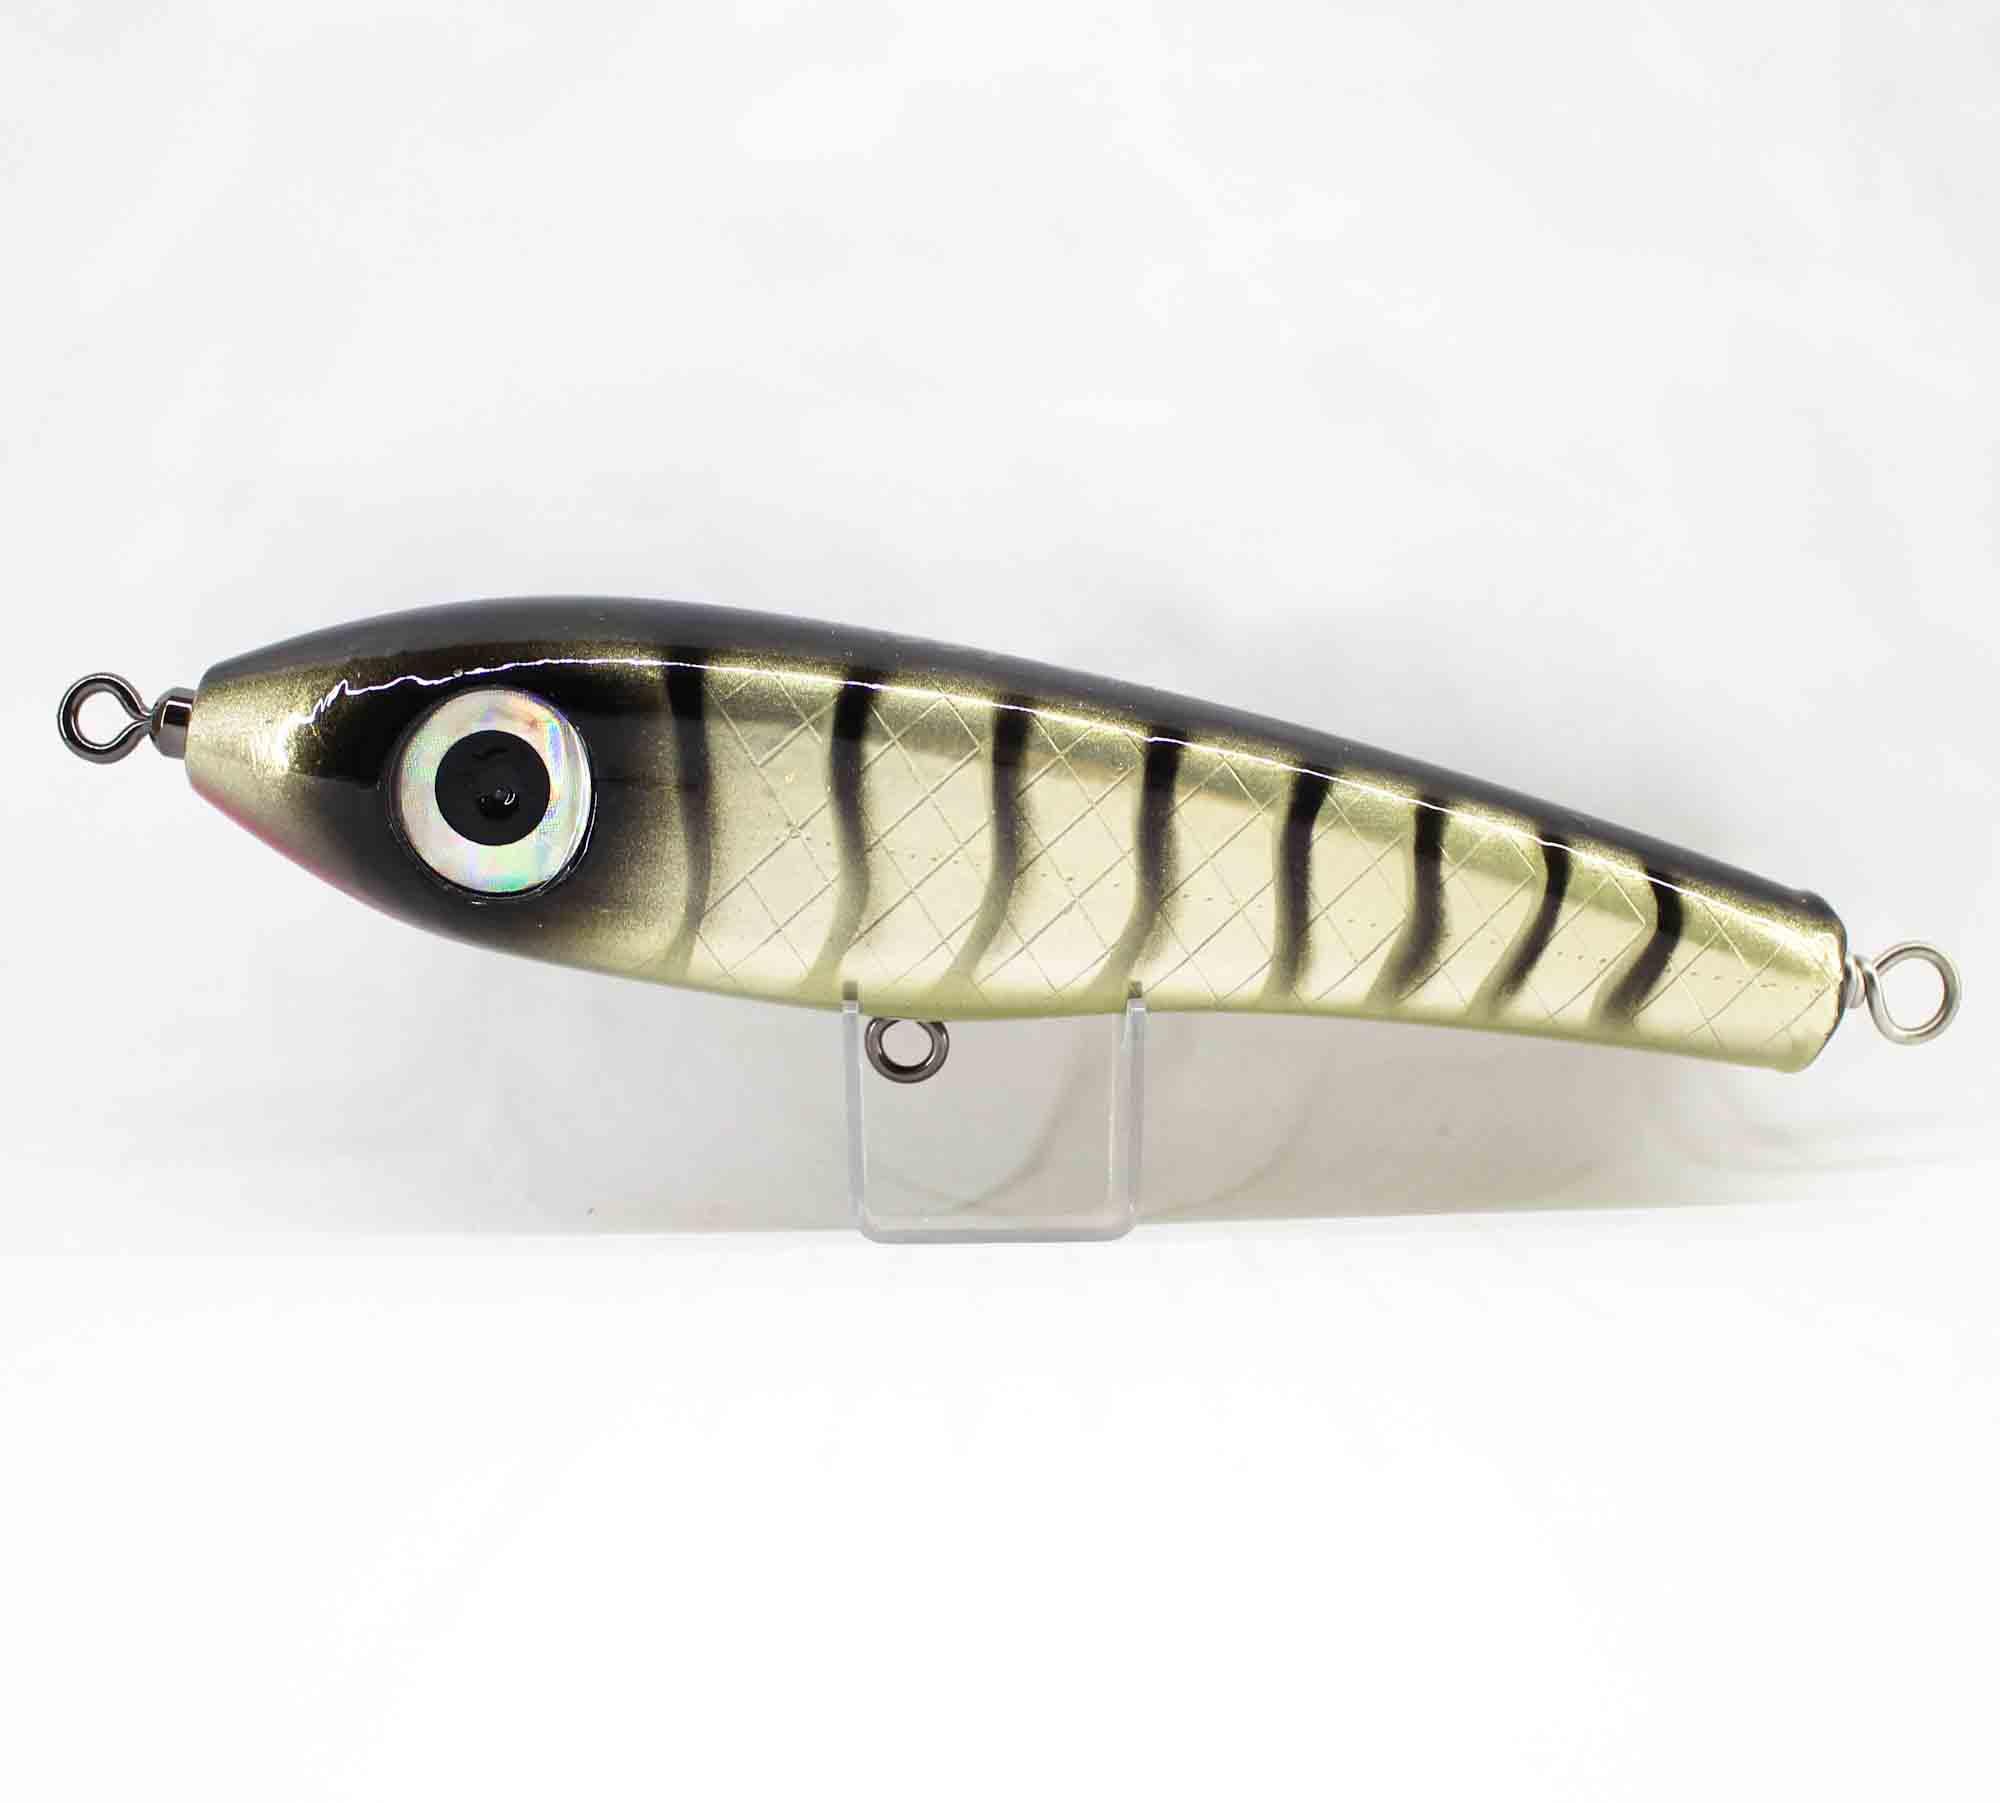 Maggy Gara Jerk Bait 1 190cm Pencil Lure Silver Mackerel (2029)